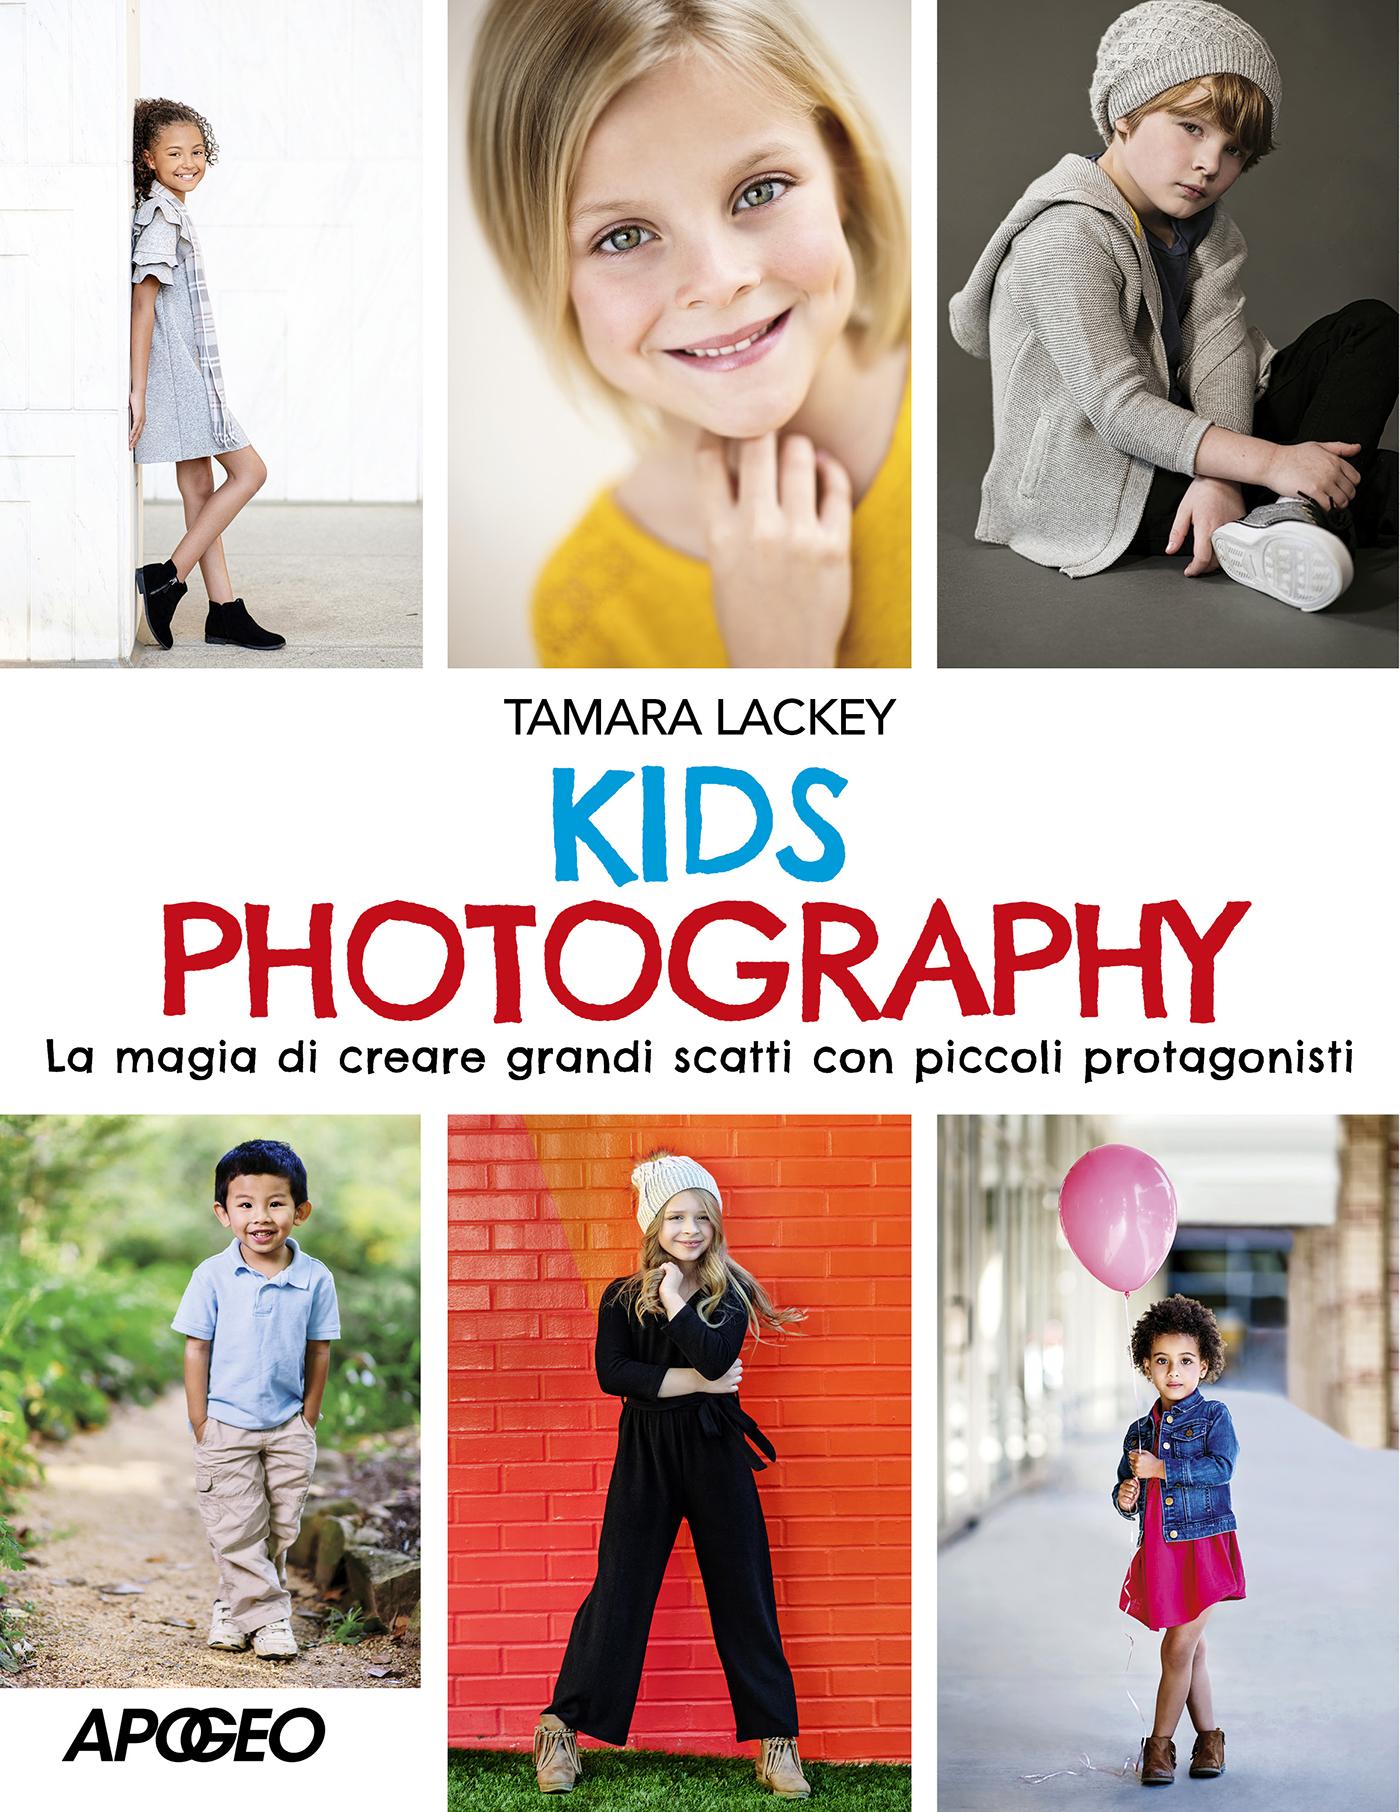 Kids Photography, di Tamara Lackey